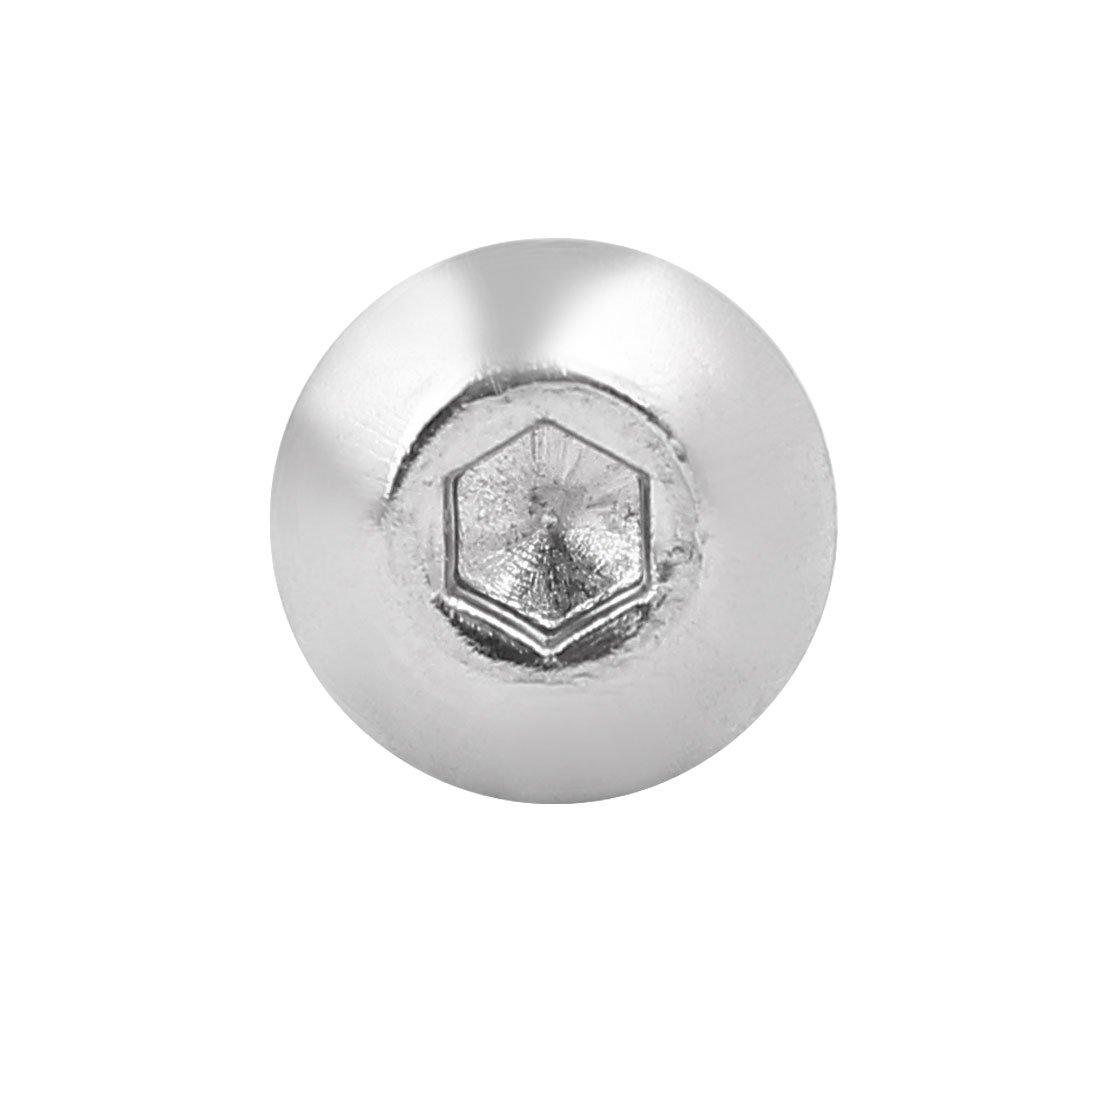 uxcell M5x35mm 304 Stainless Steel Button Head Hex Socket Cap Screws Bolts 50pcs a17022100ux0056